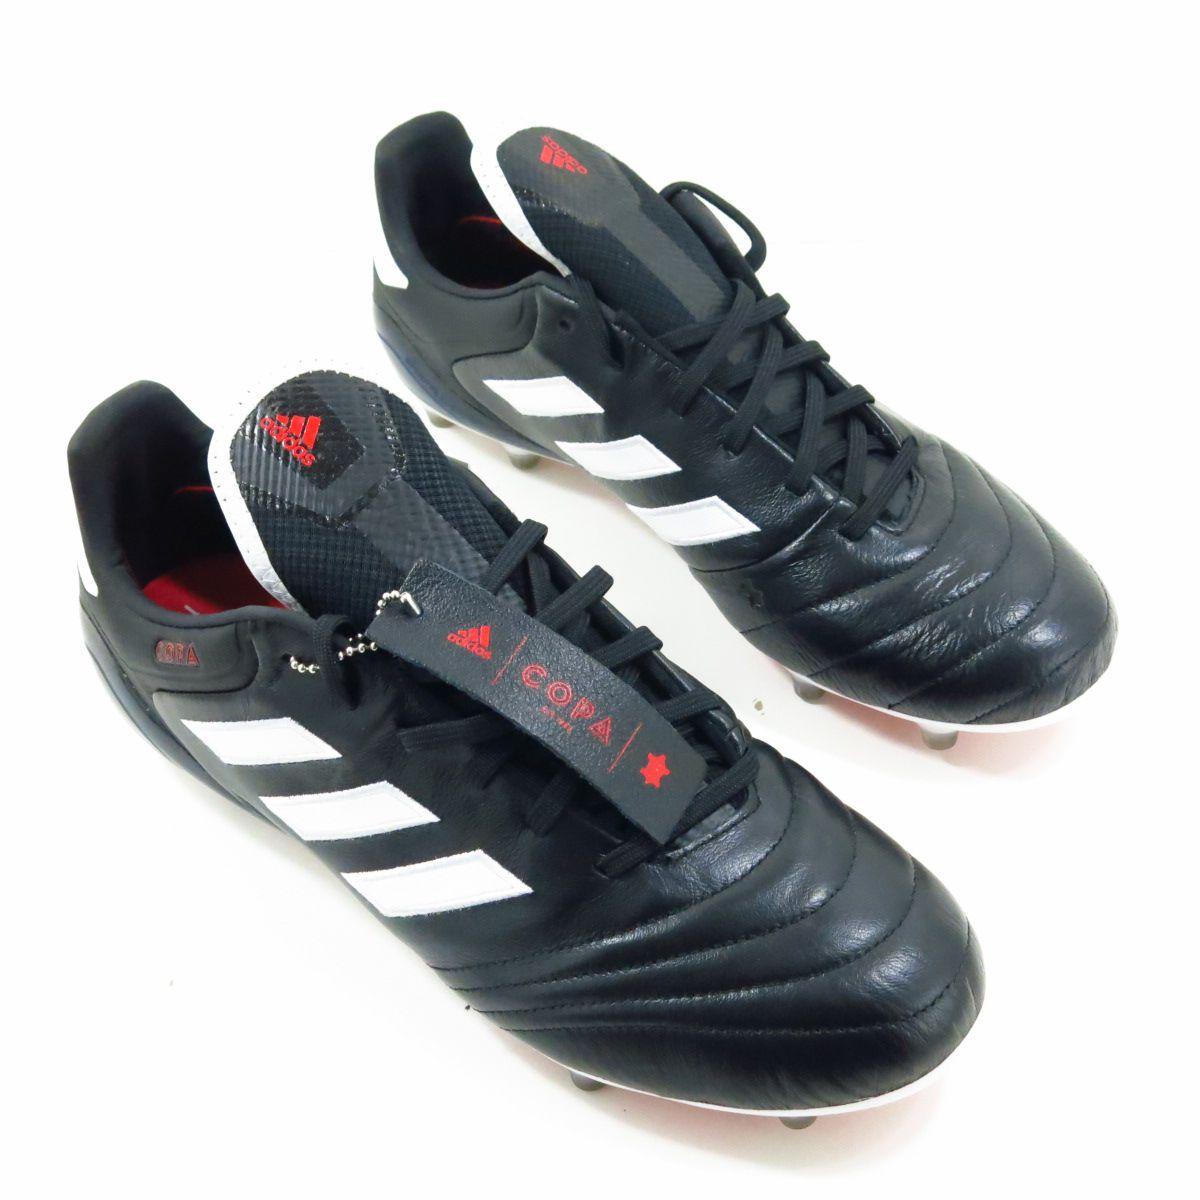 Chuteira Adidas Copa 17.1 FG - Couro de Canguru